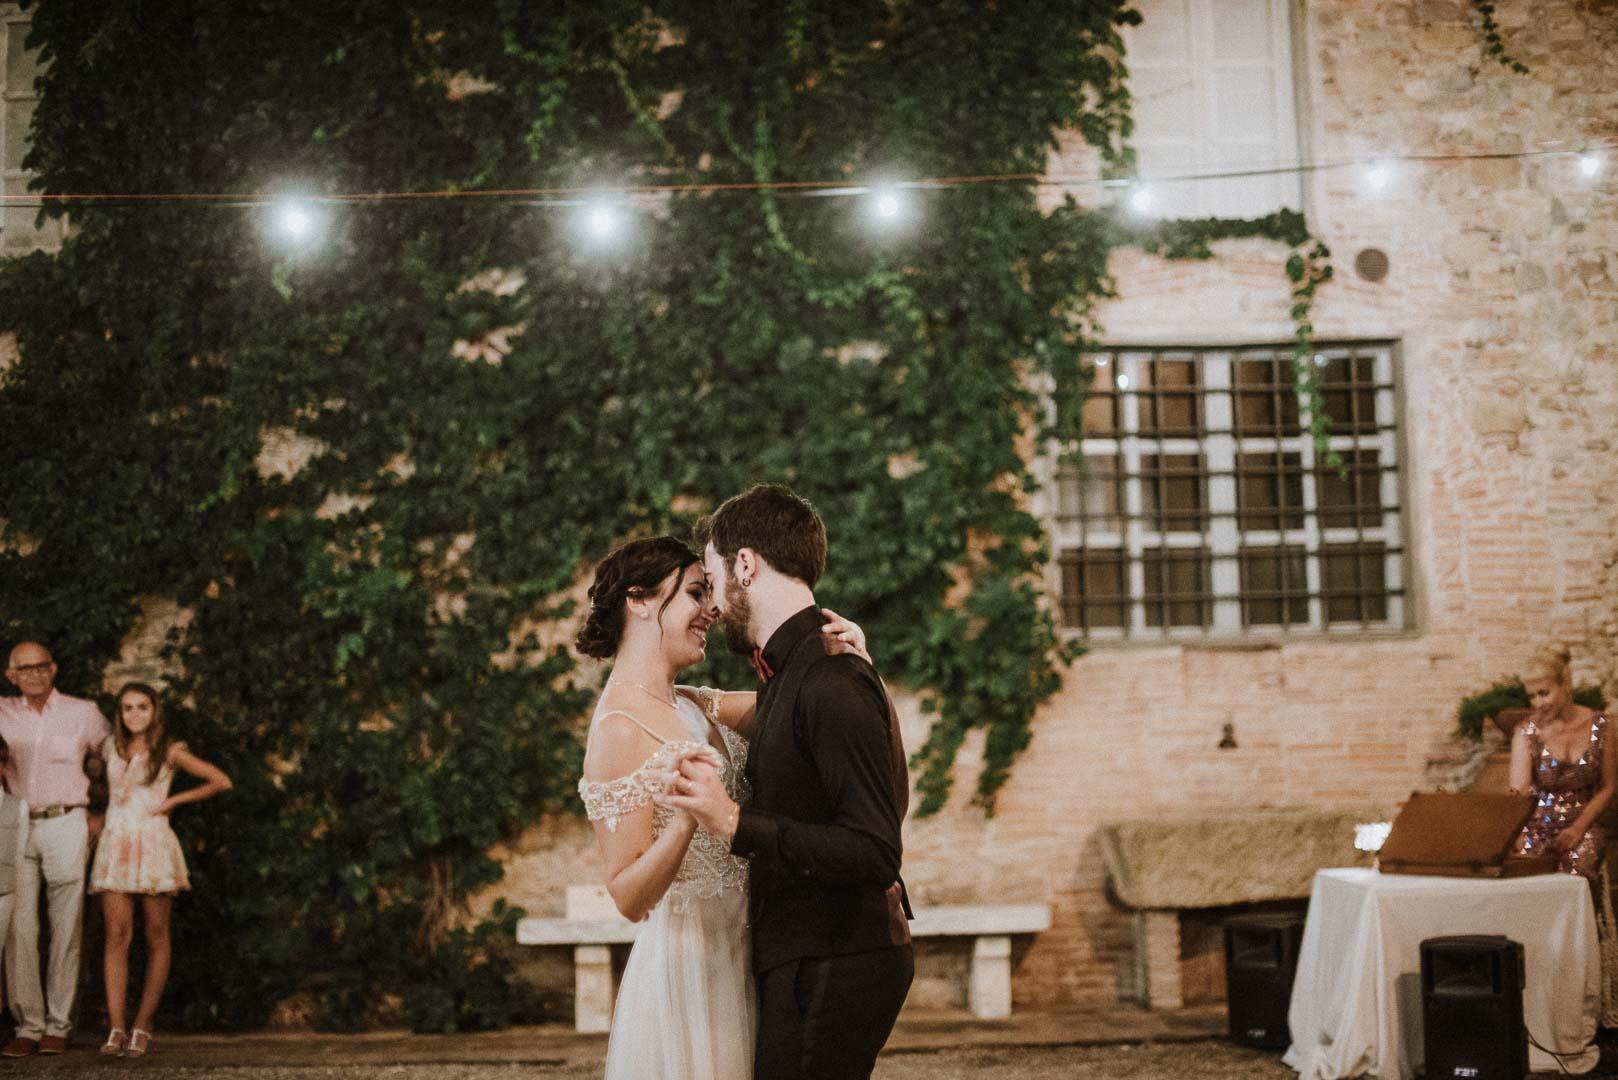 wedding-photographer-destination-fineart-bespoke-reportage-tuscany-villascorzi-vivianeizzo-spazio46-184